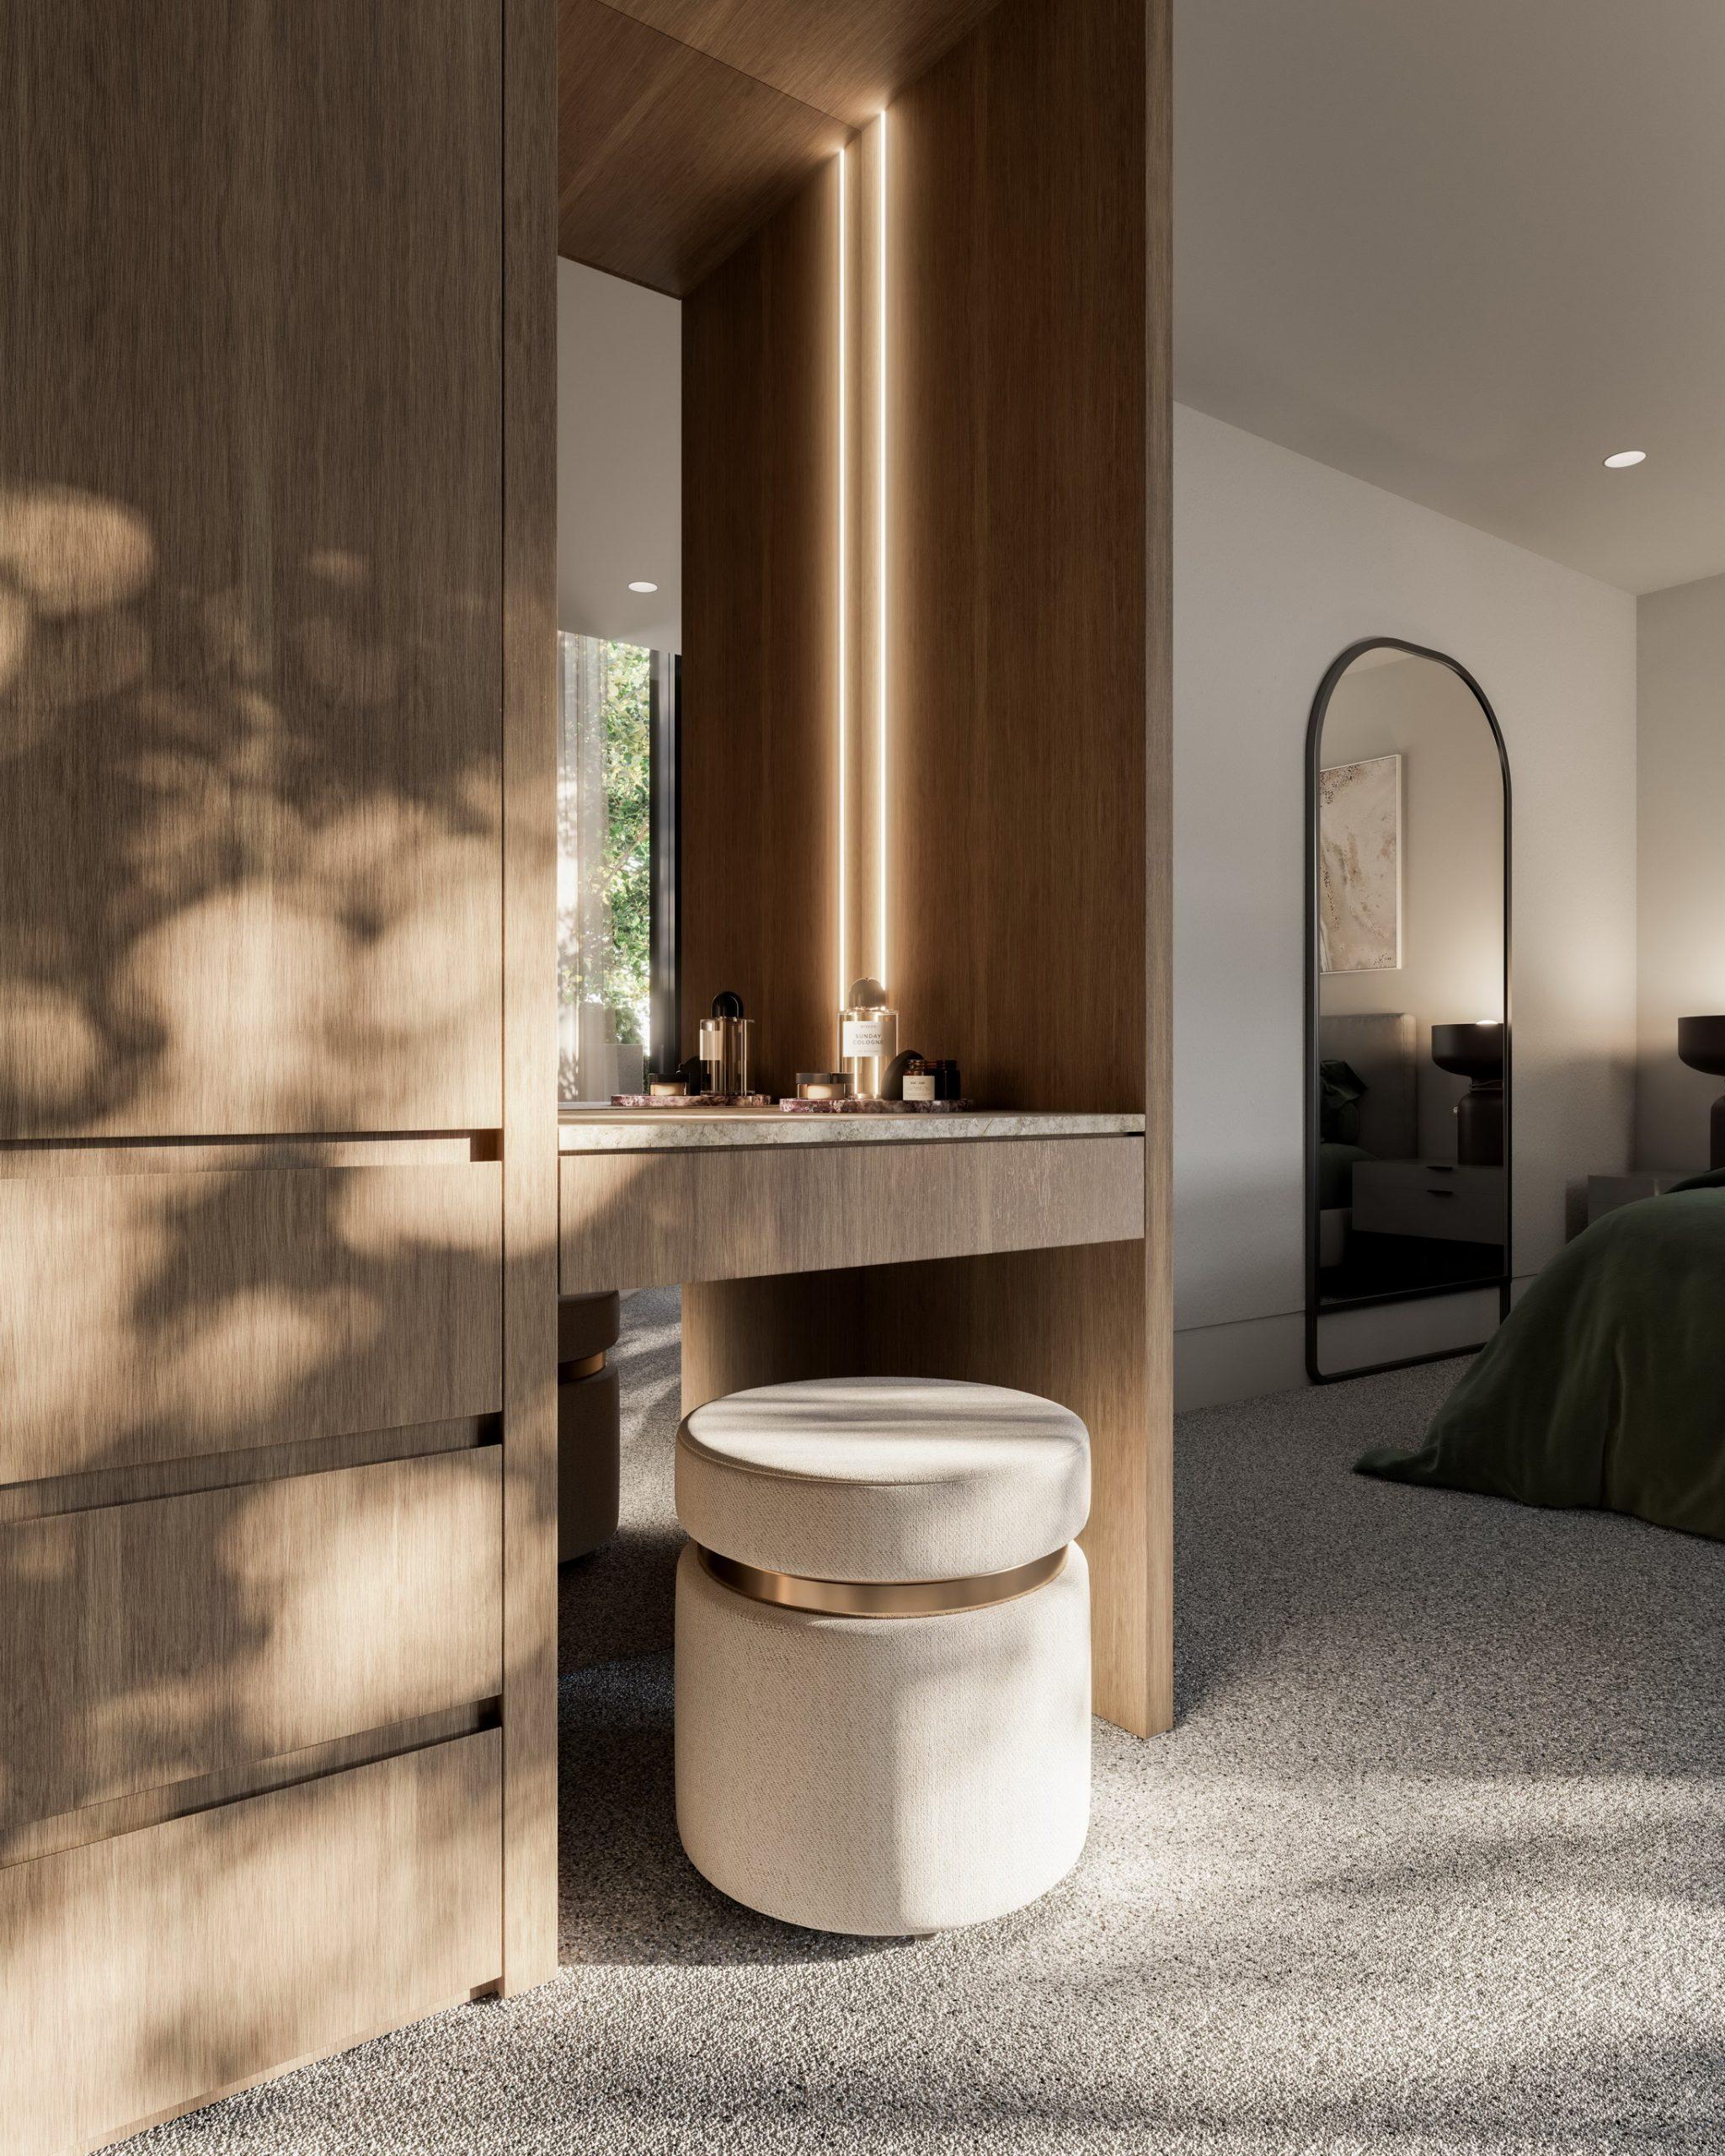 fkd-studio-3d-archiecture-visualisation-cgi-archviz-eaglemont-interior-fireplace-wardrobe-vignette-detail